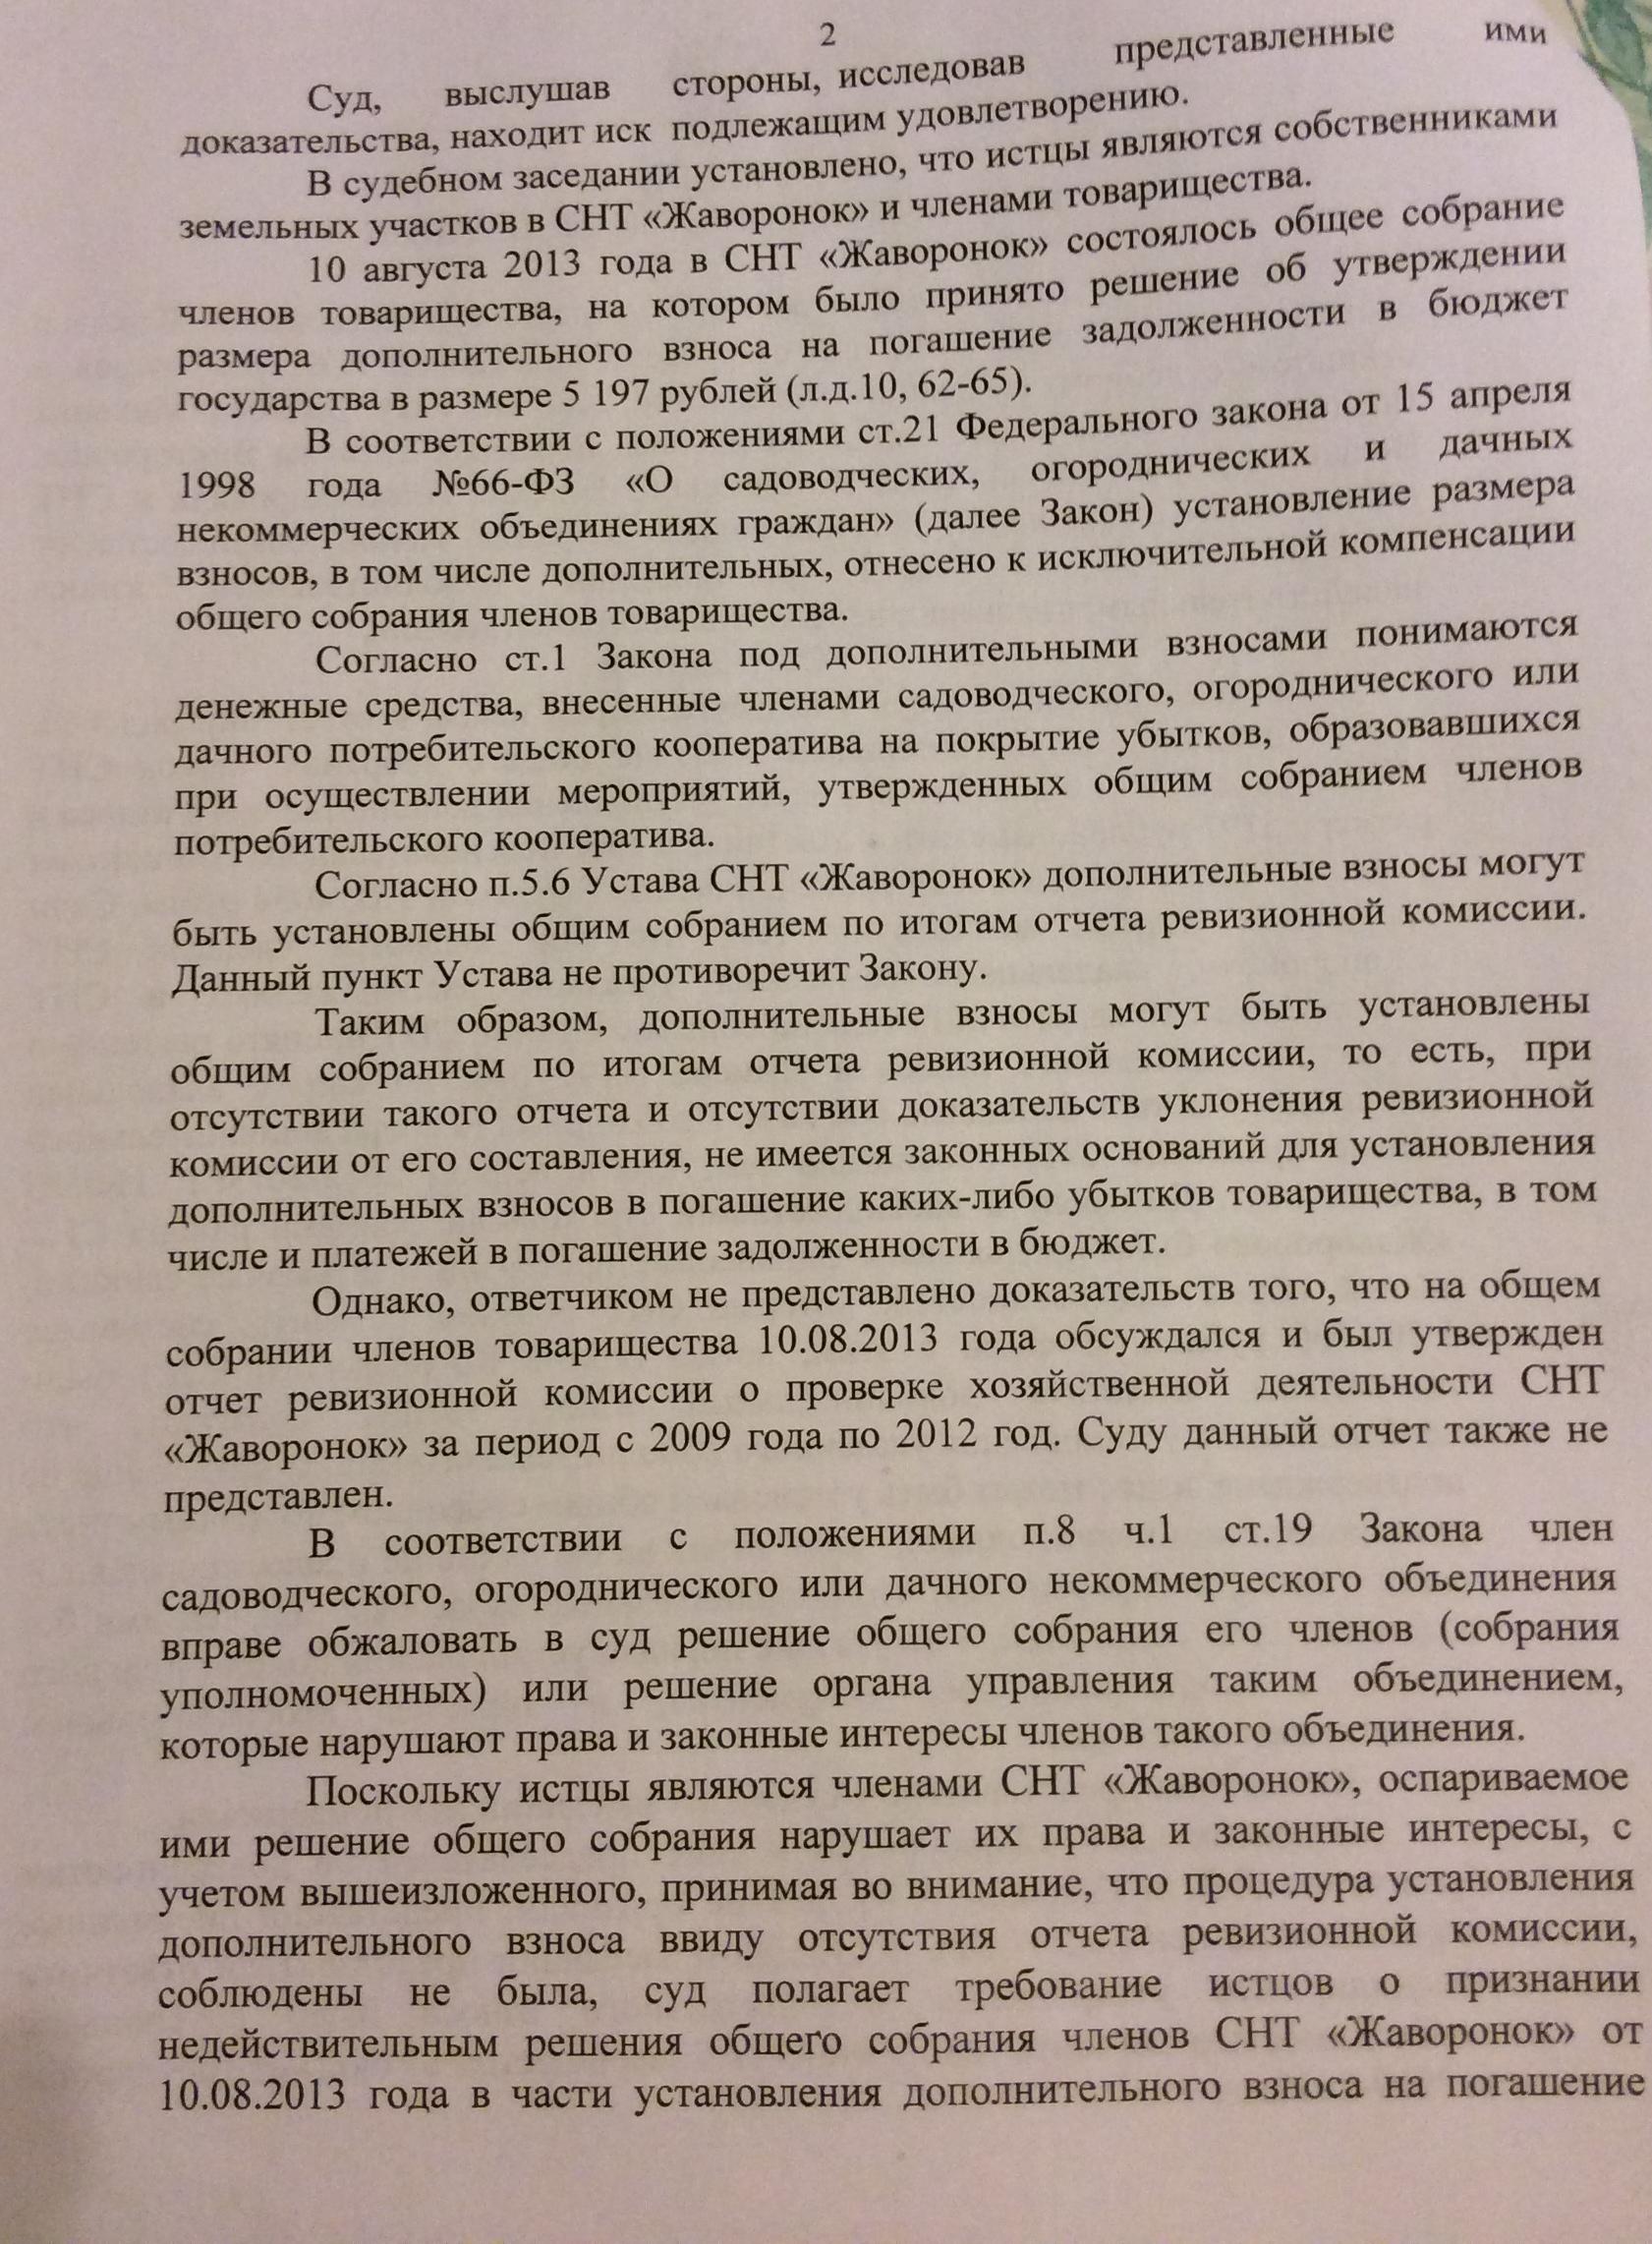 обман суда по гражданскому делу